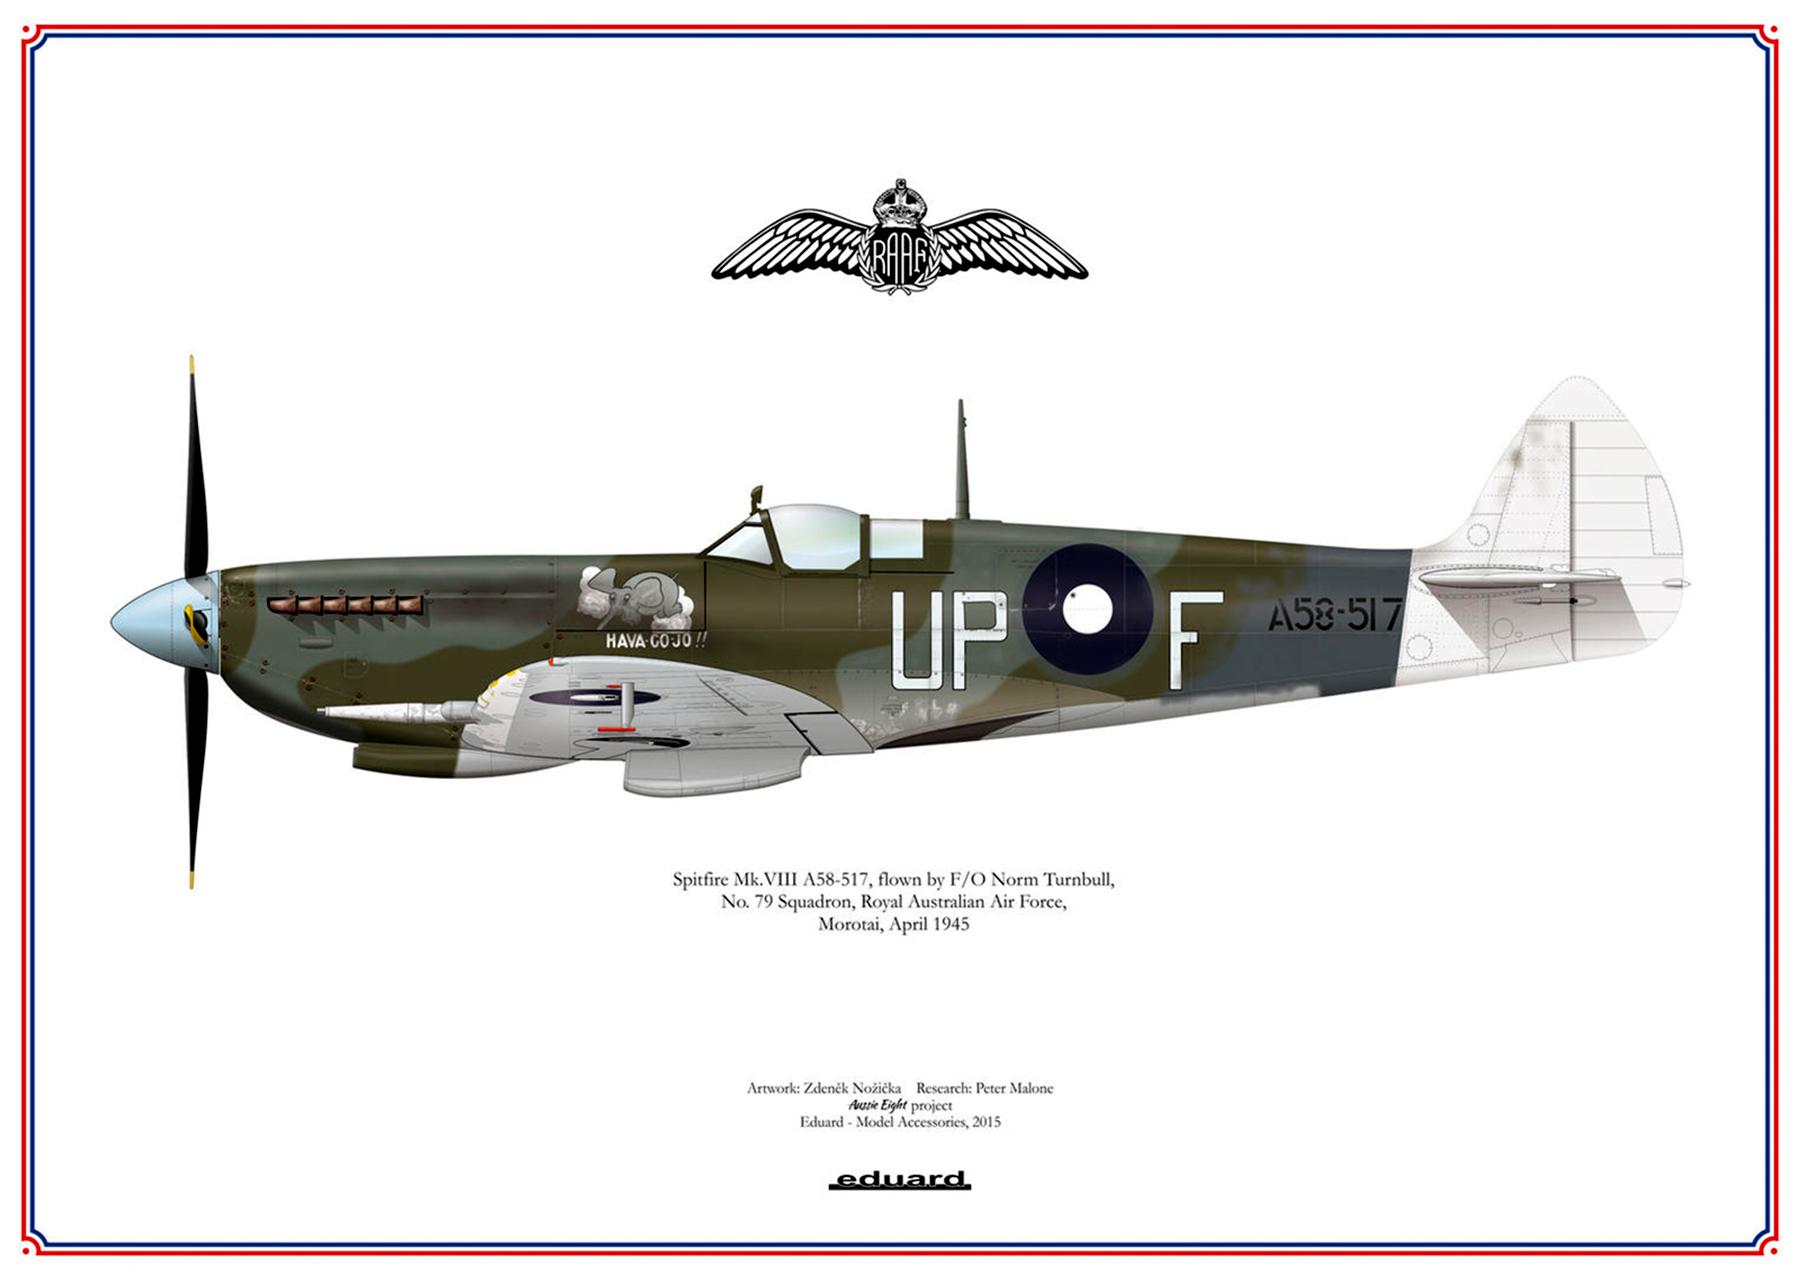 Spitfire LFVIII RAAF 79Sqn UPF Norman Smithell A58 517 Morotai 1945 0B